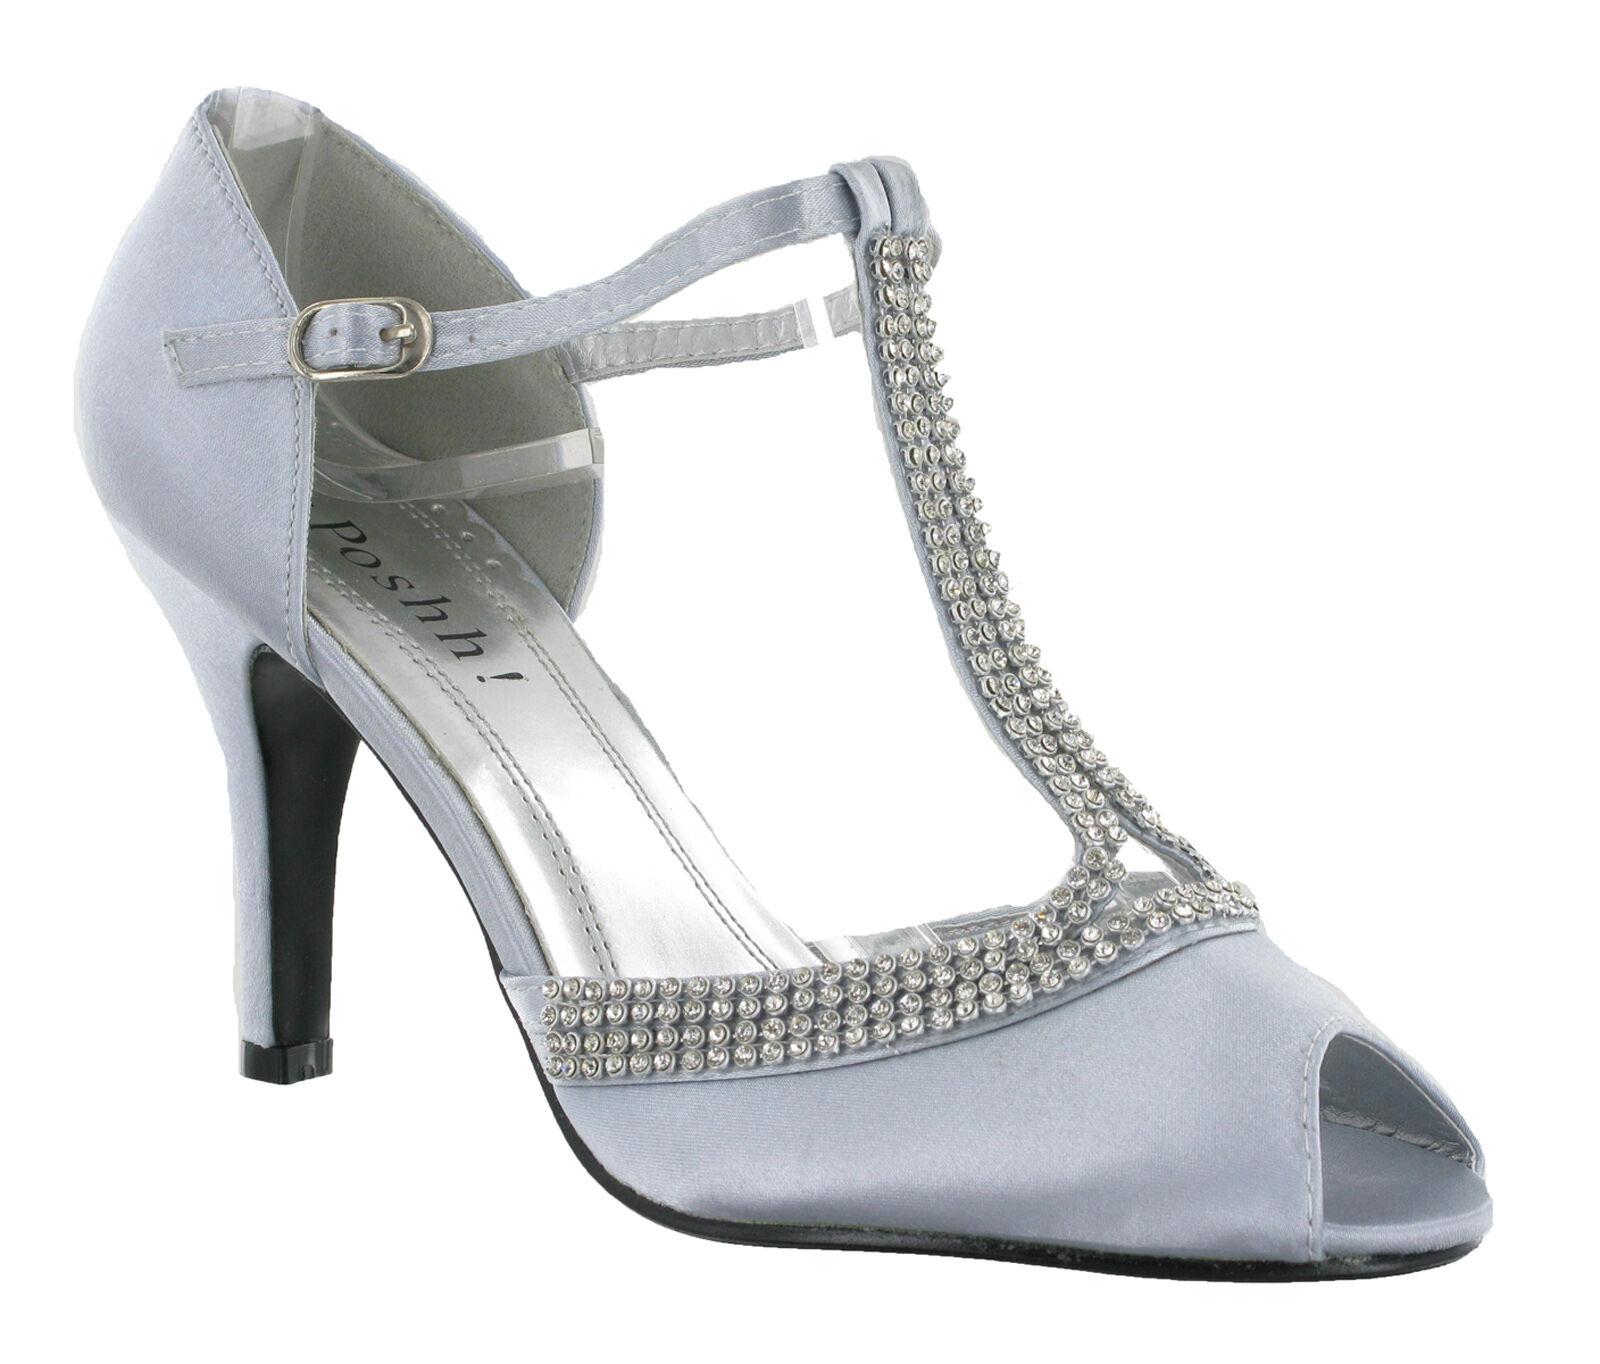 ff64834c4713f9 T-Bar Heels Diamante Bridal Wedding Party Dress Womens Evening Shoes UK 3-8